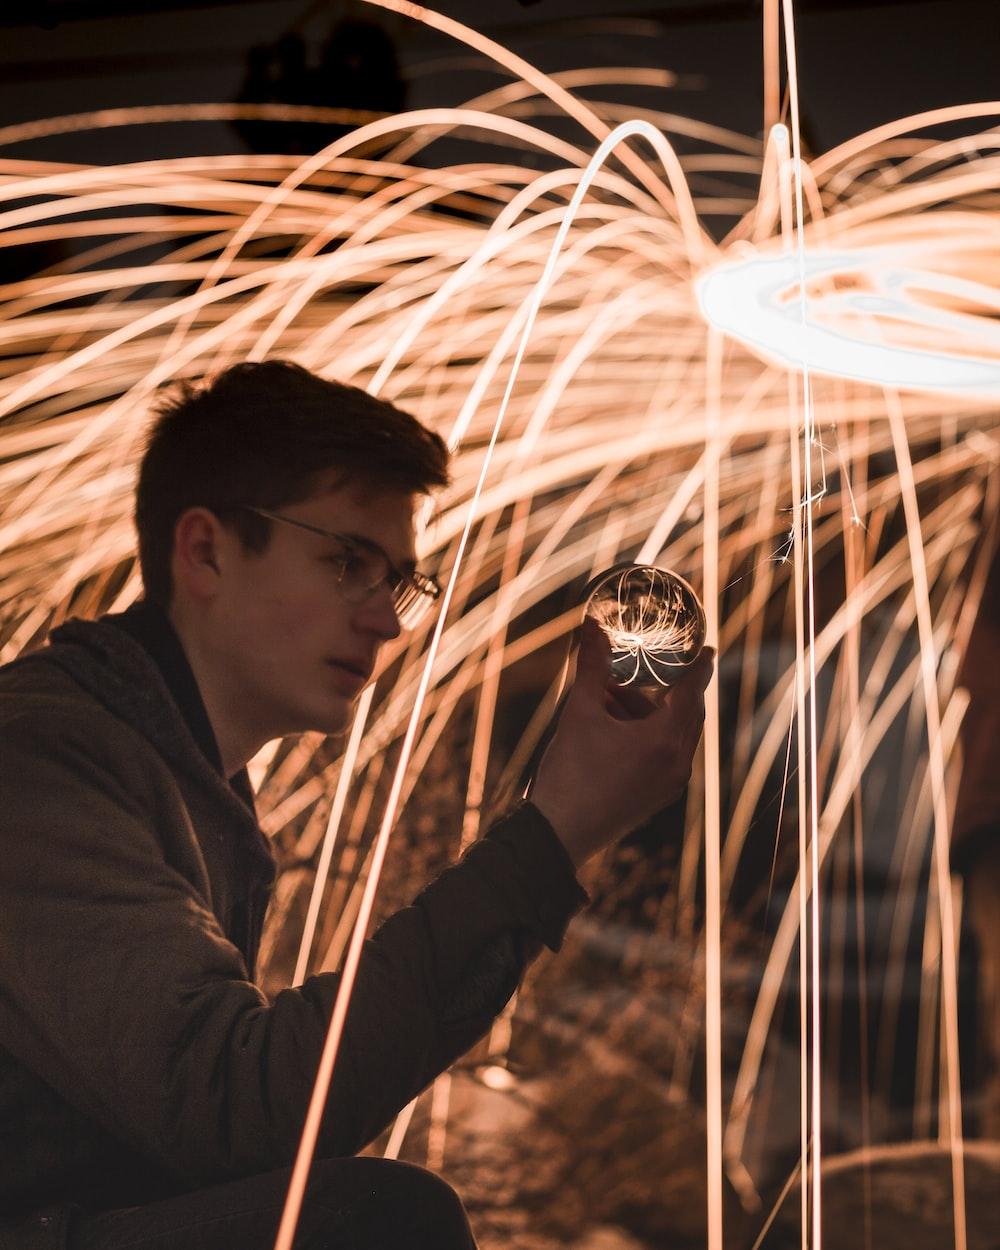 man holding crystal ball